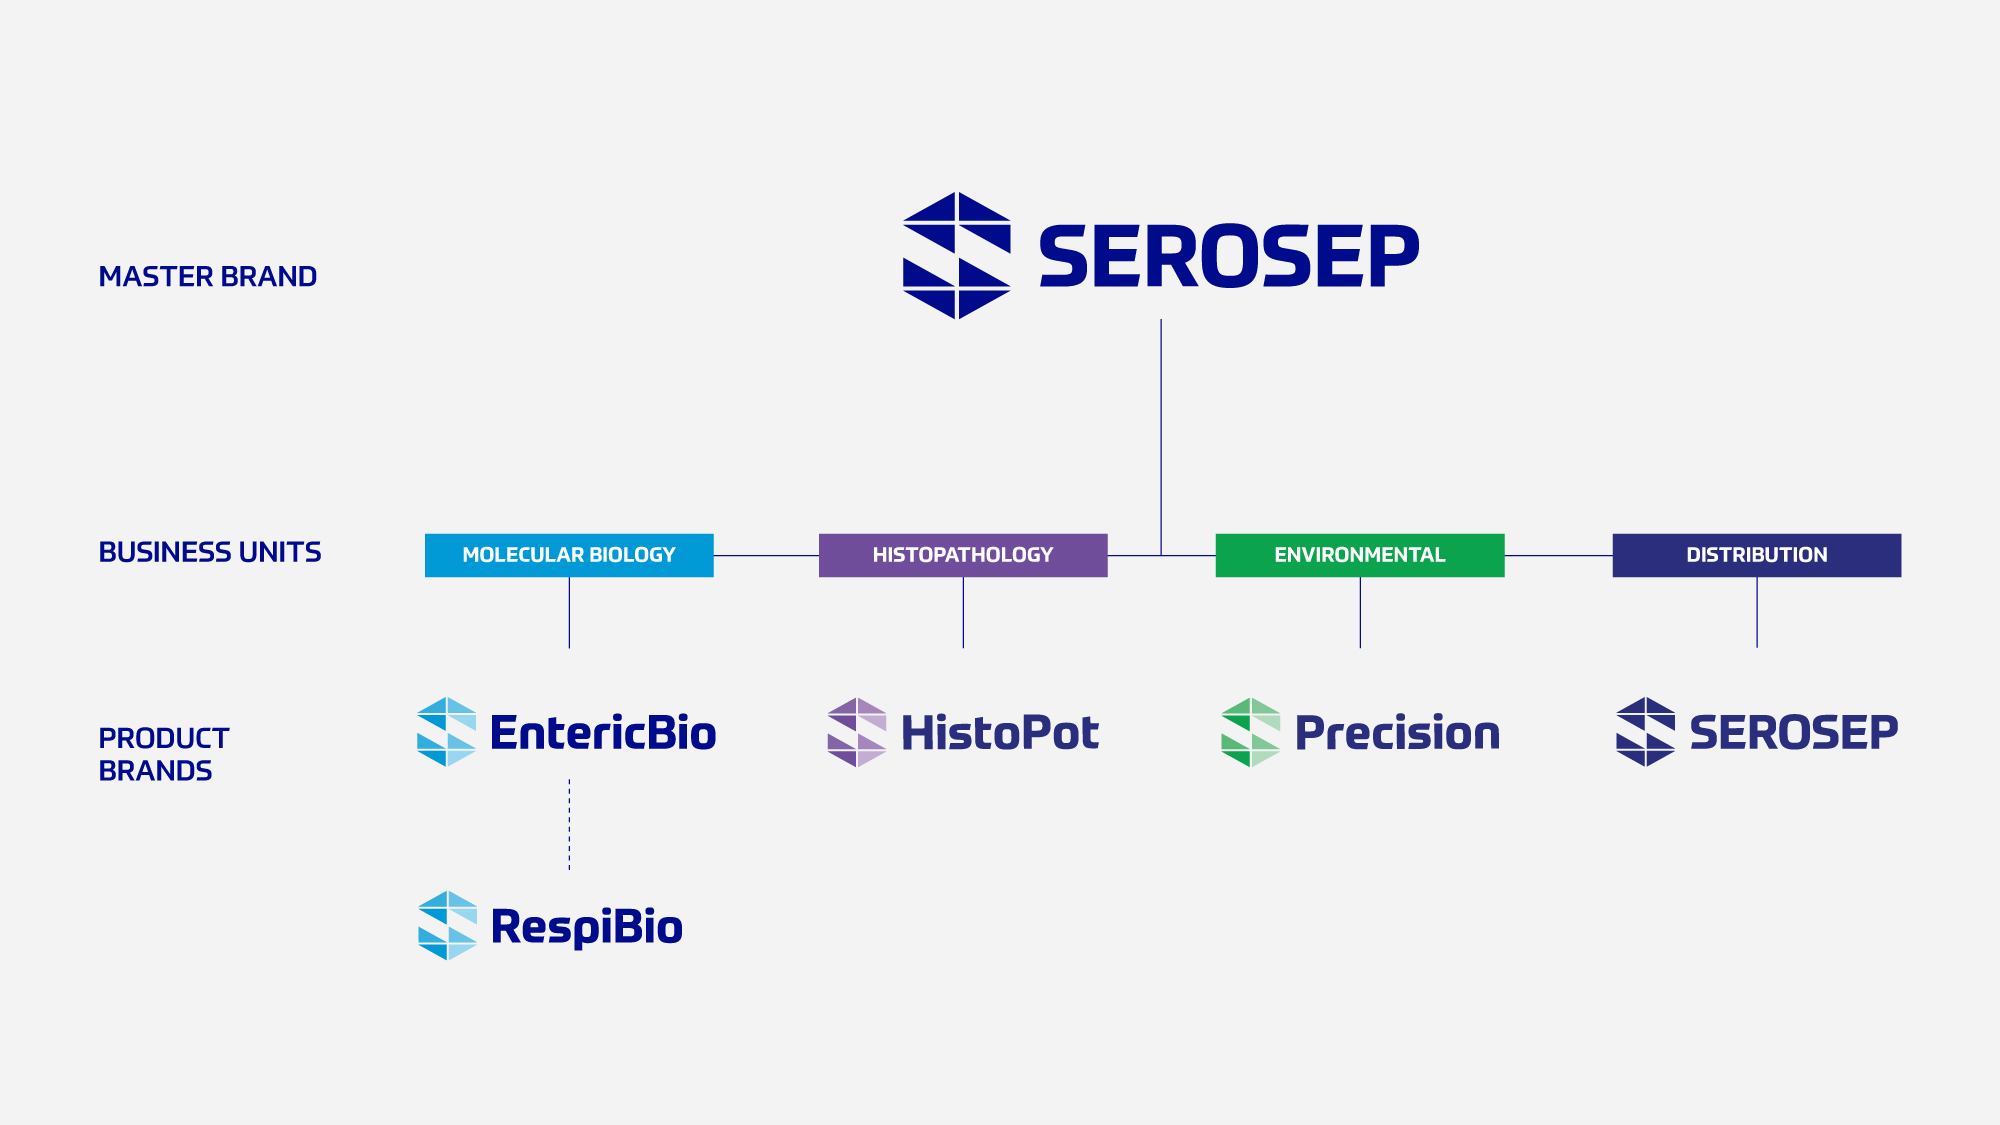 DW_Serosep_Brand_Architecture